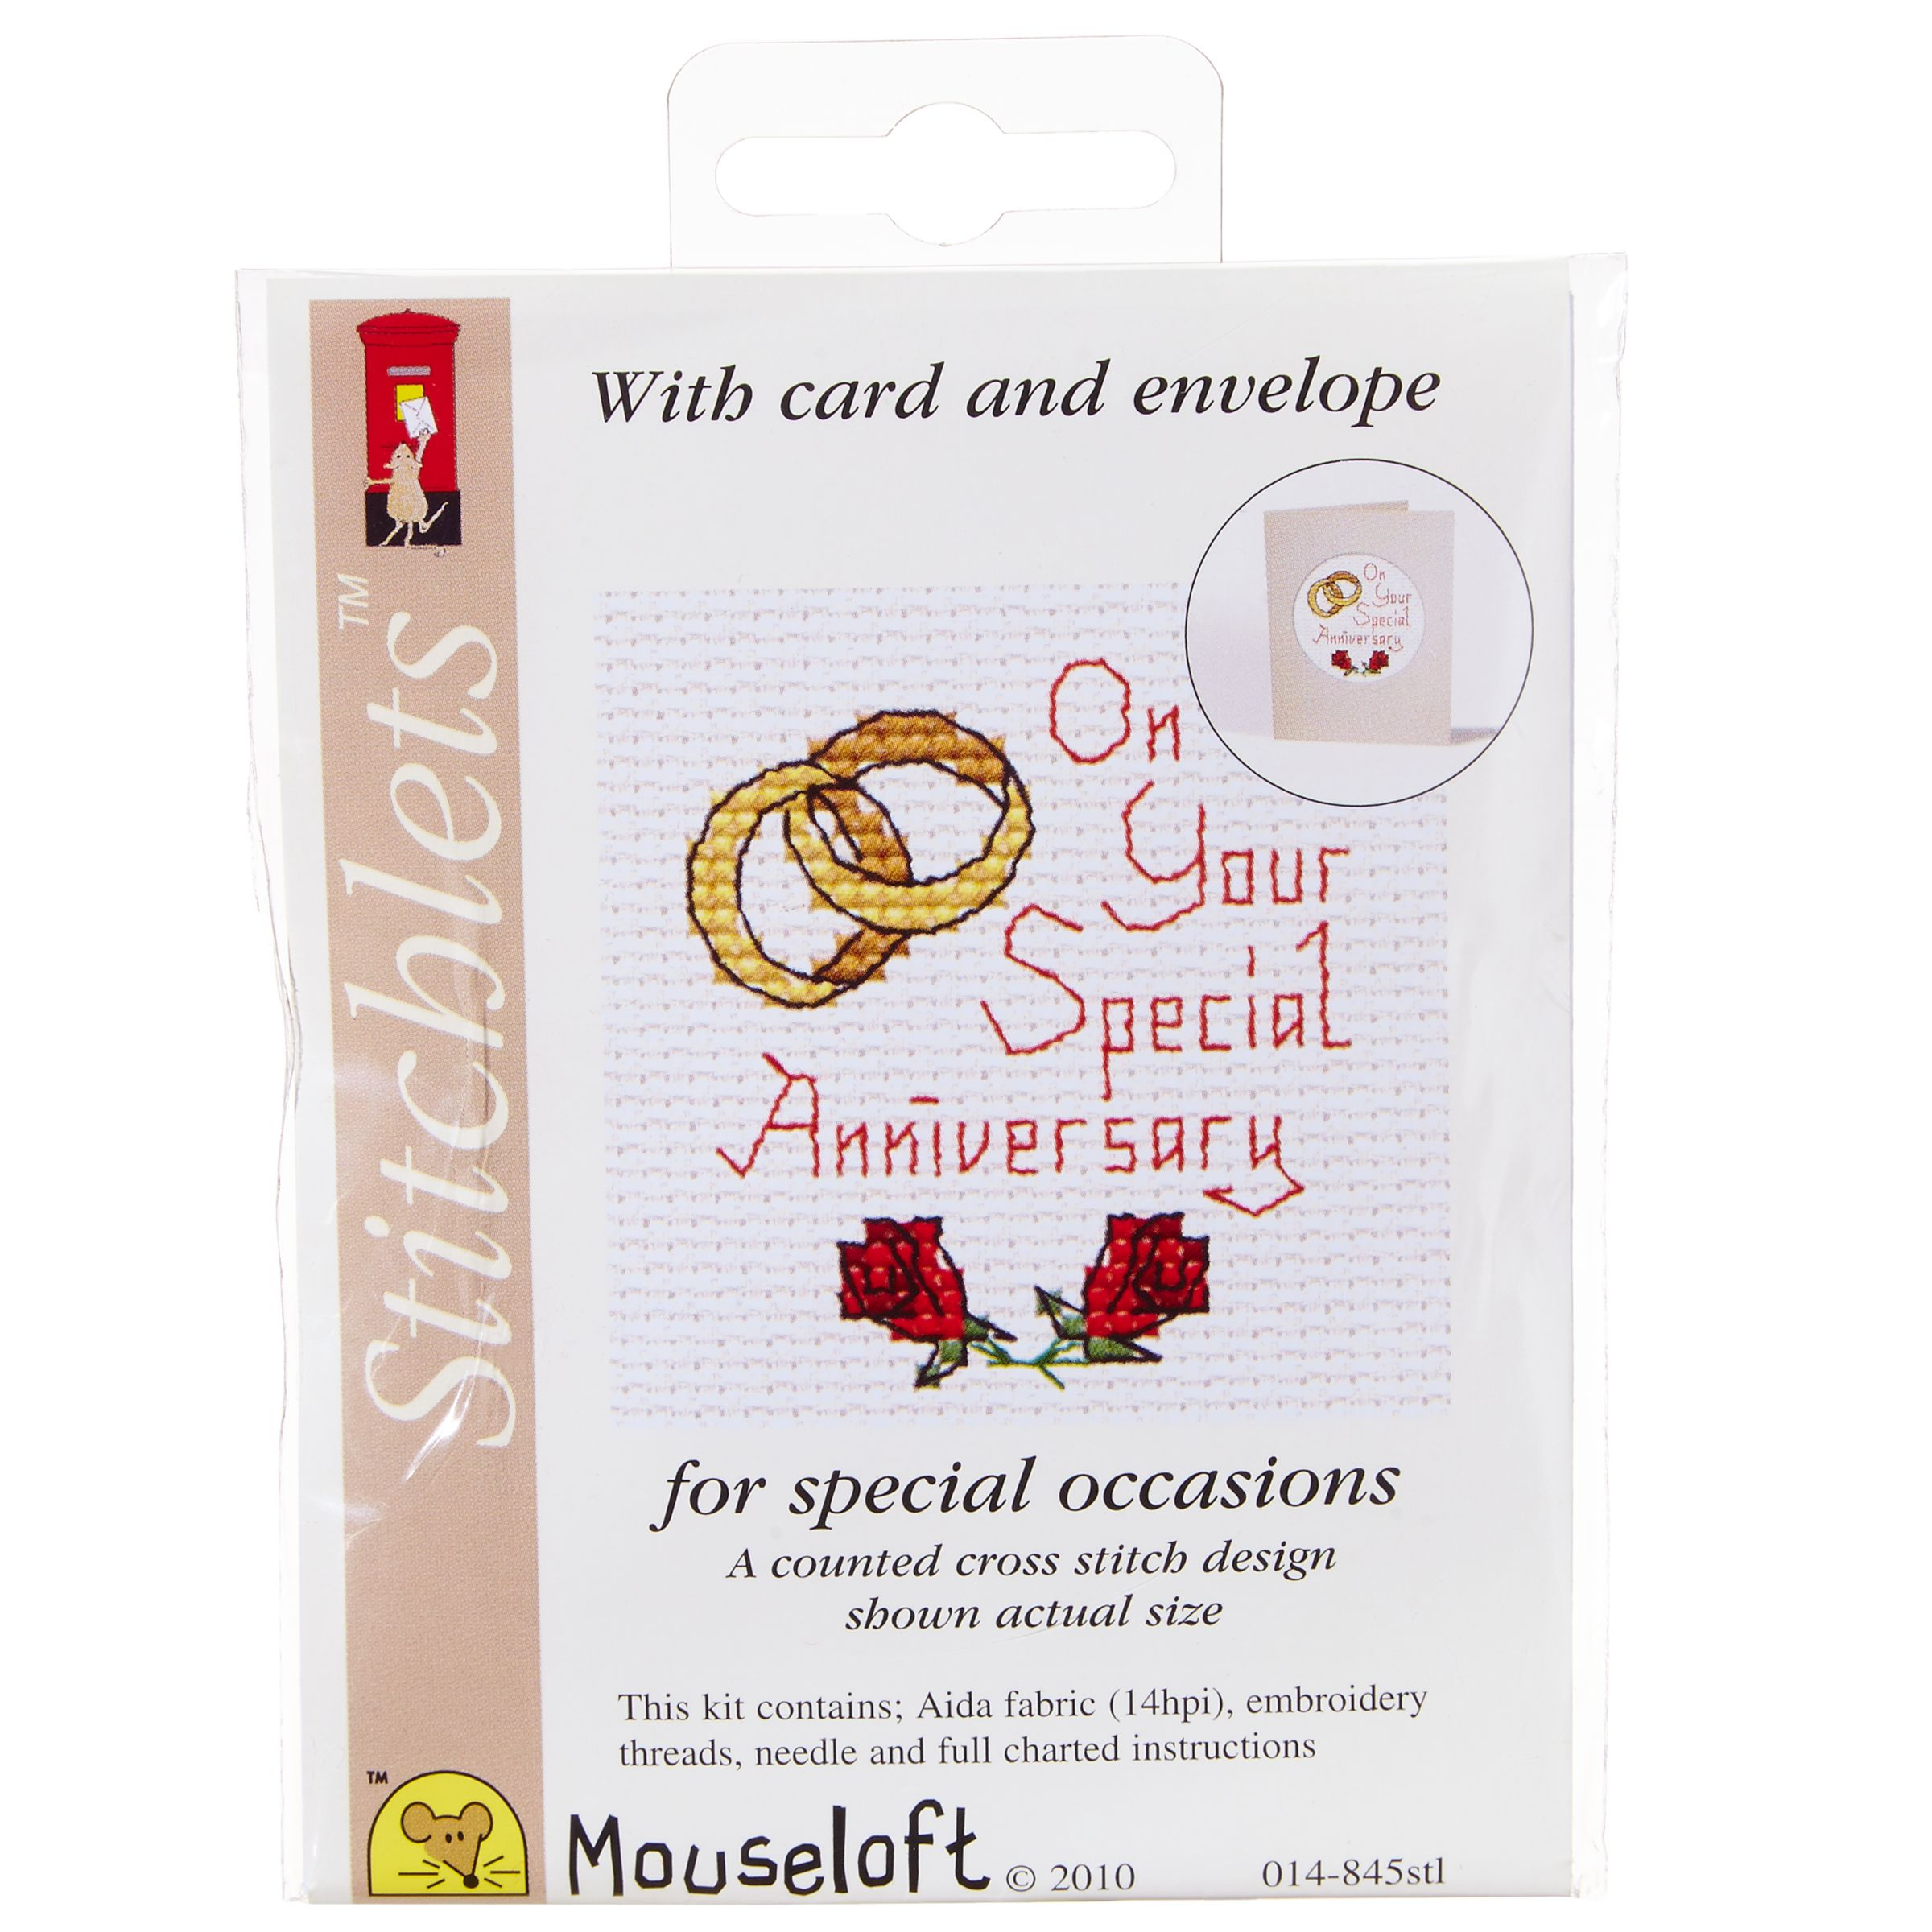 Mouseloft Mouseloft Special Anniversary Cross Stitch Kit